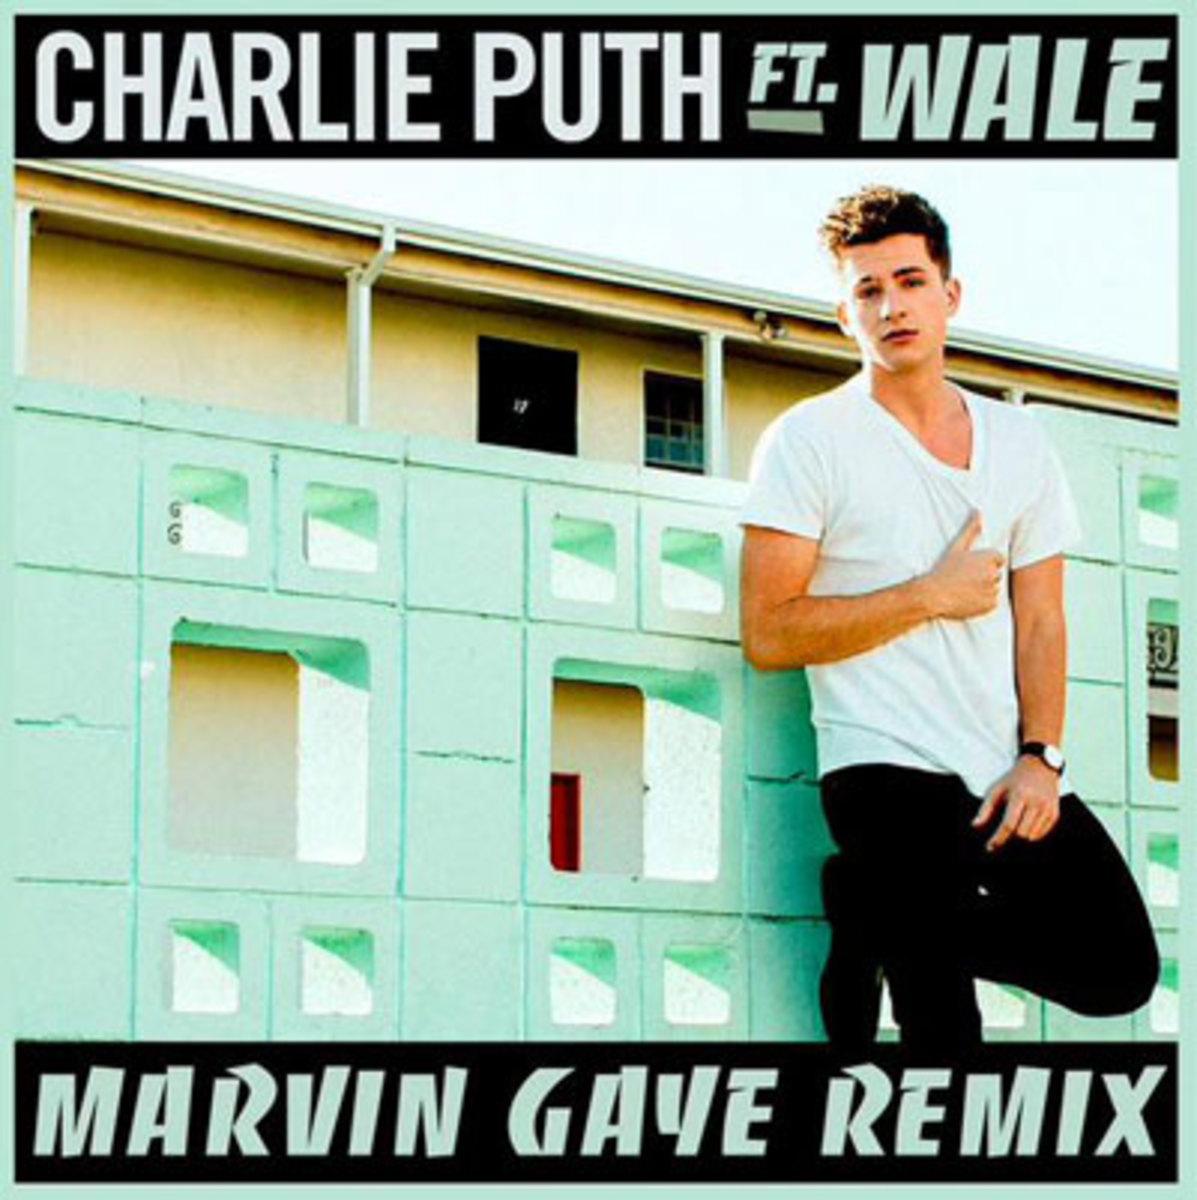 charlie-puth-marvin-gaye-remix.jpg